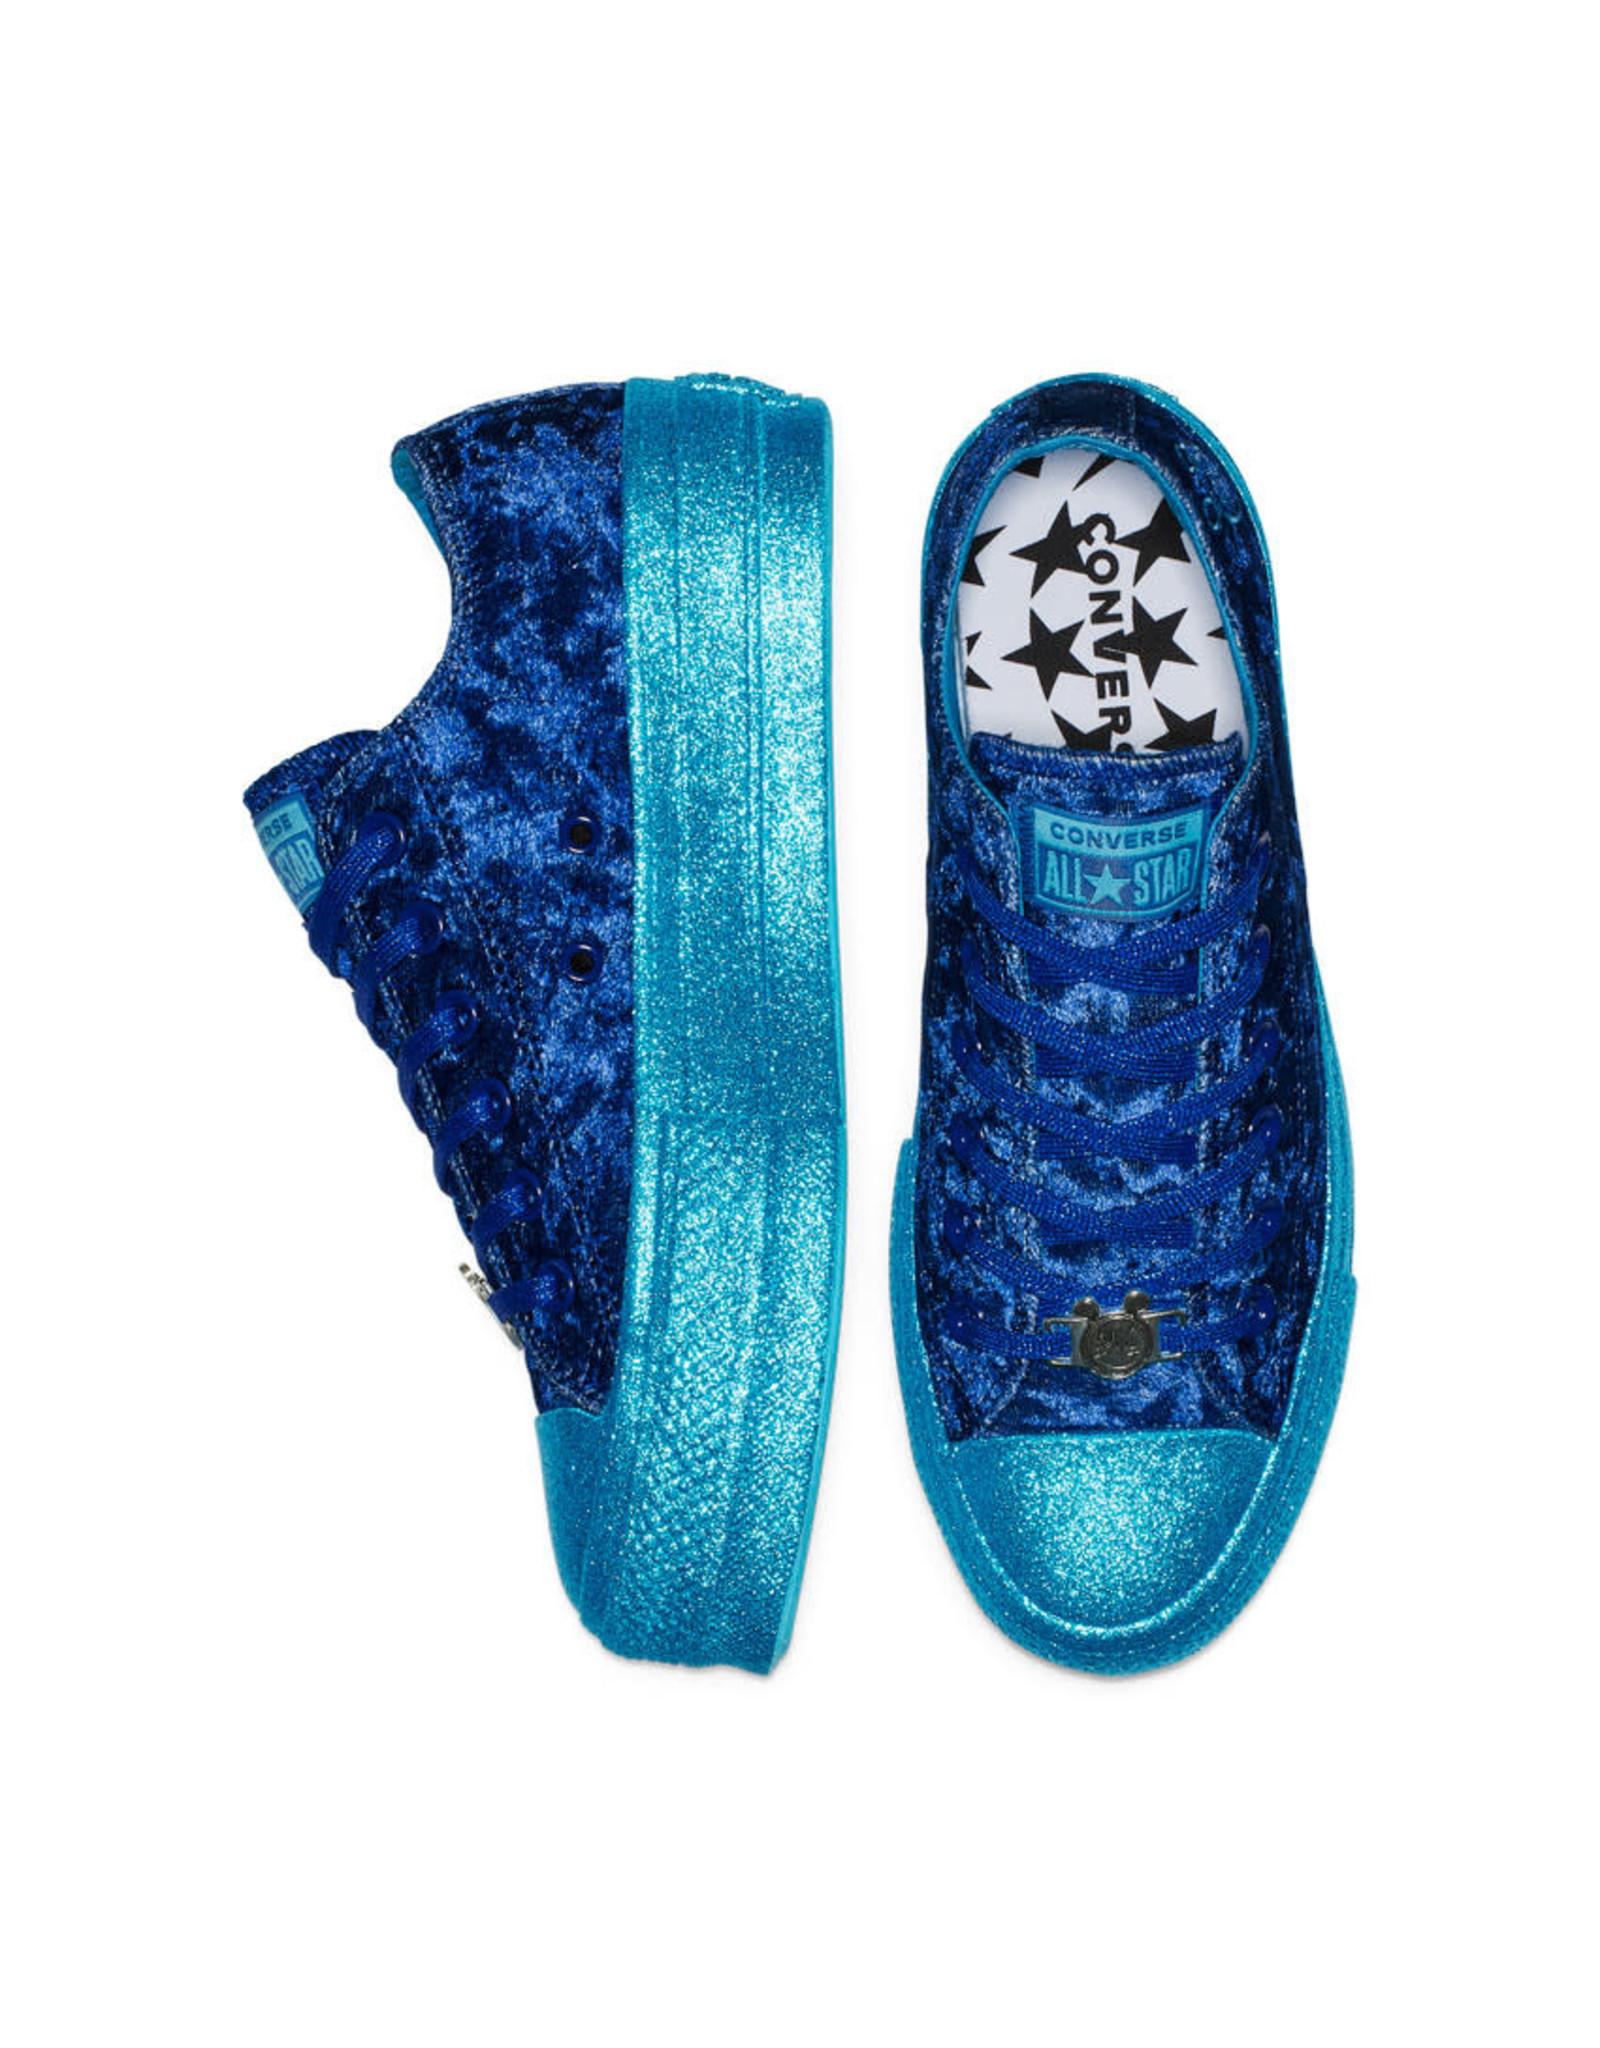 CONVERSE CHUCK TAYLOR AS  LIFT OX MILEY CYRUS GNARLY BLUE/BLUE C13MCG-563721C